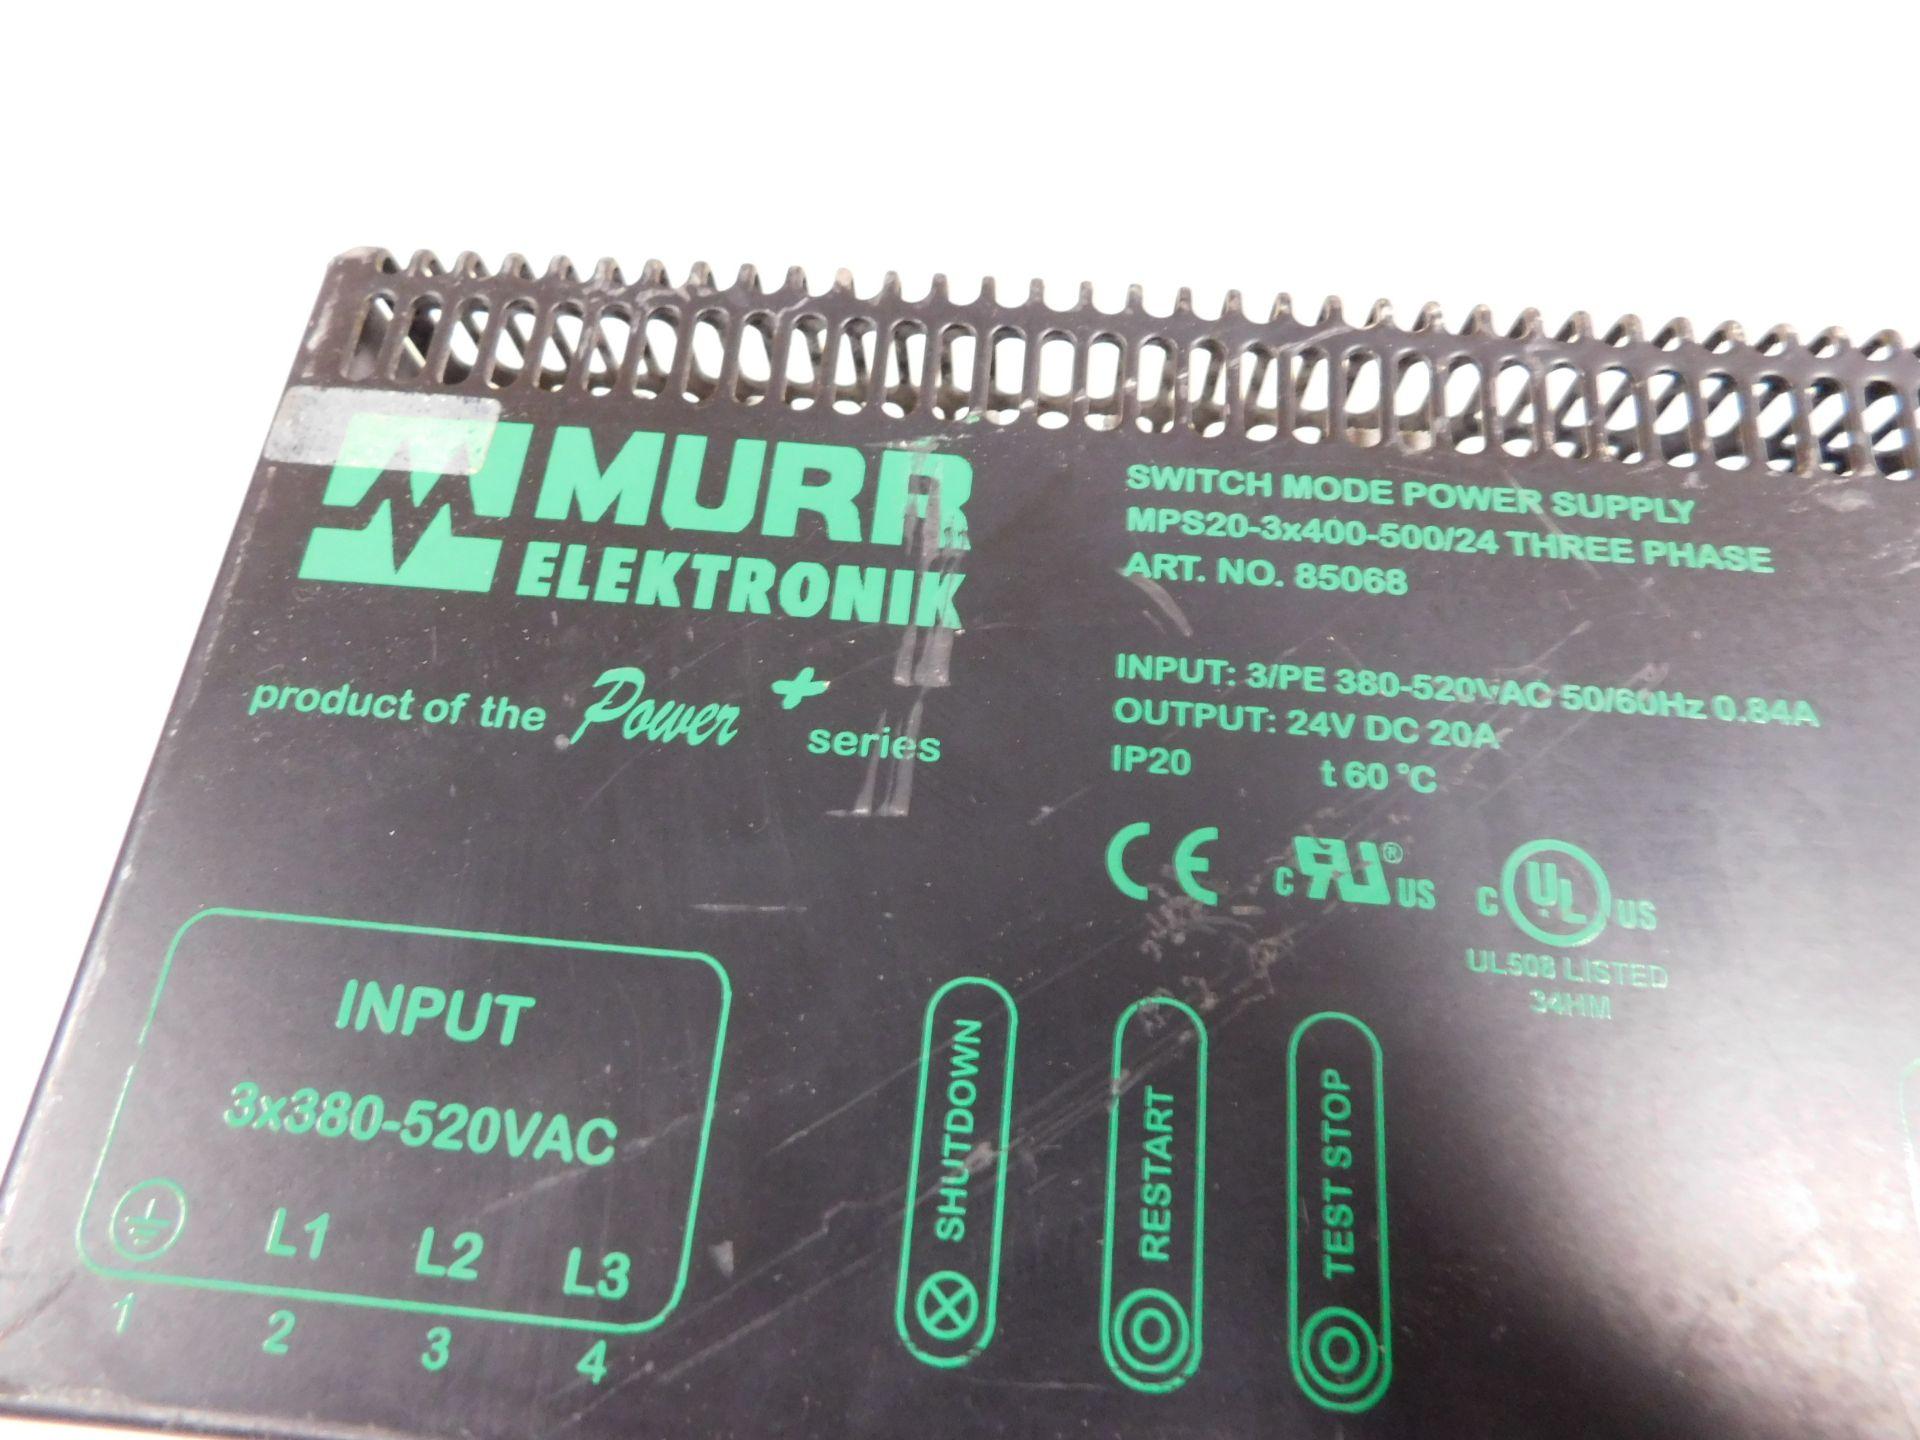 MURR ELEKTRONIC MPS20-3X400-500/24 - Image 3 of 4